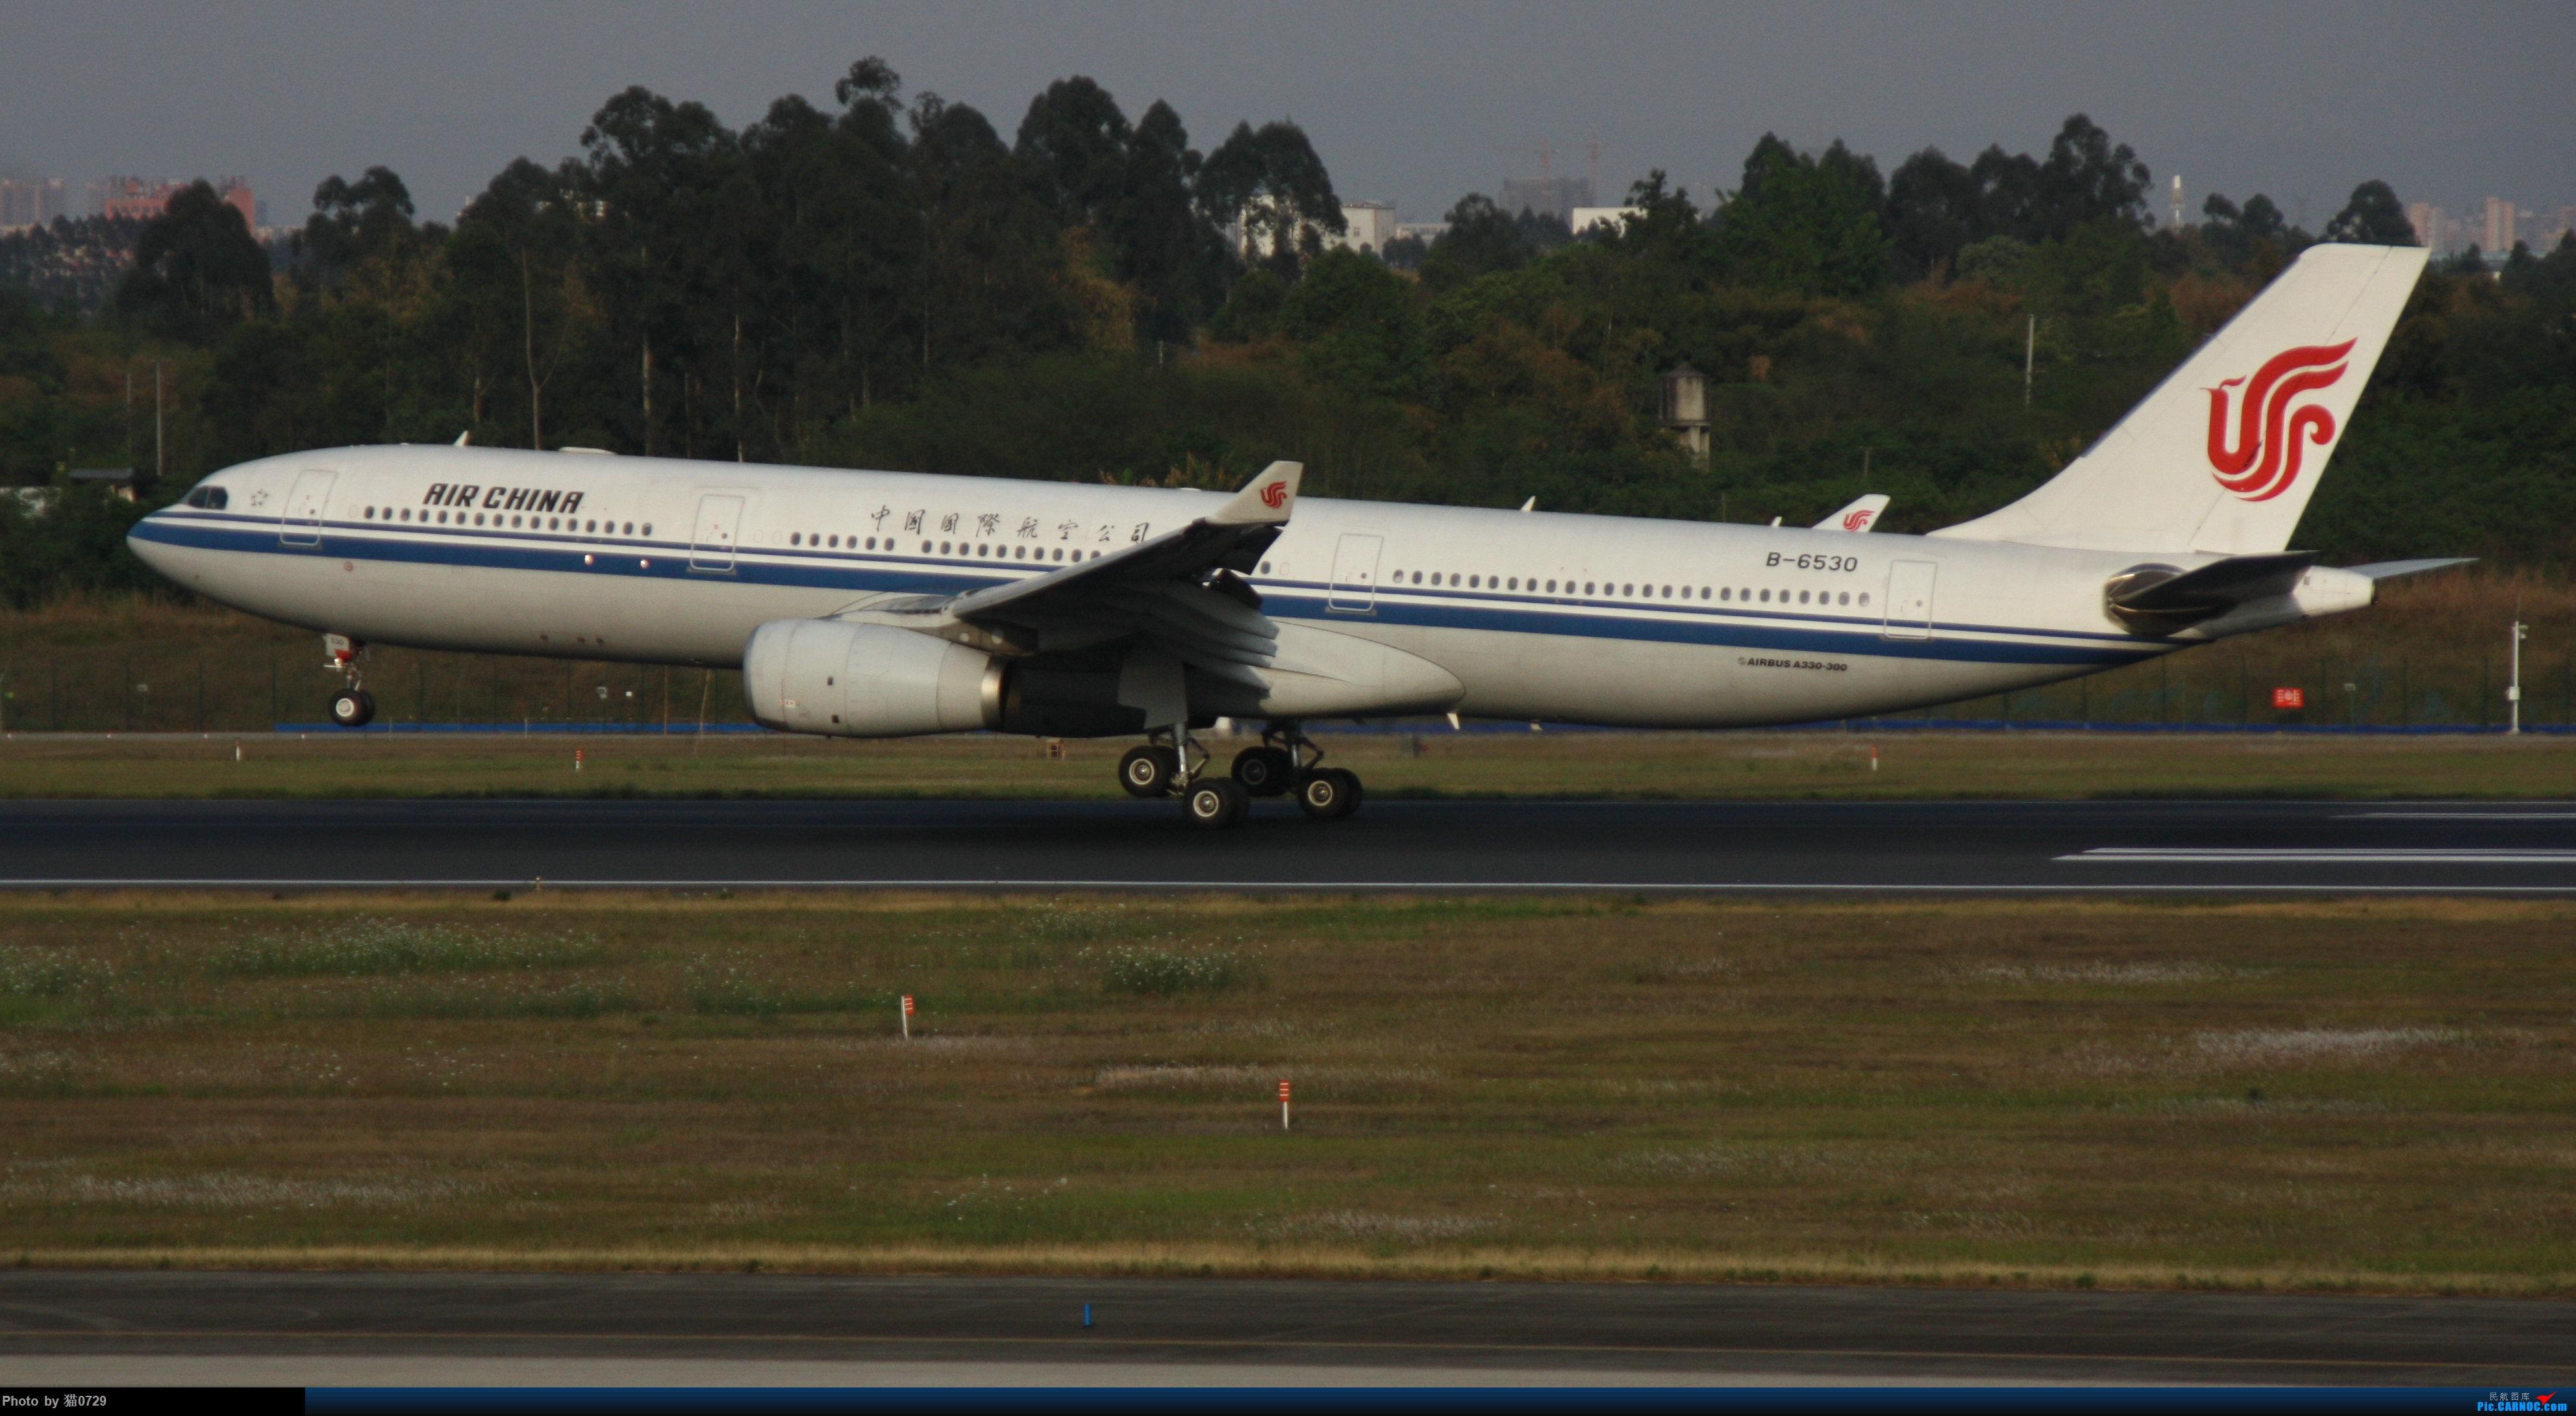 Re:[原创]CTU 119.425 水泥 伊朗346 巴基斯坦777 AIRBUS A330-300 B-6530 中国成都双流国际机场